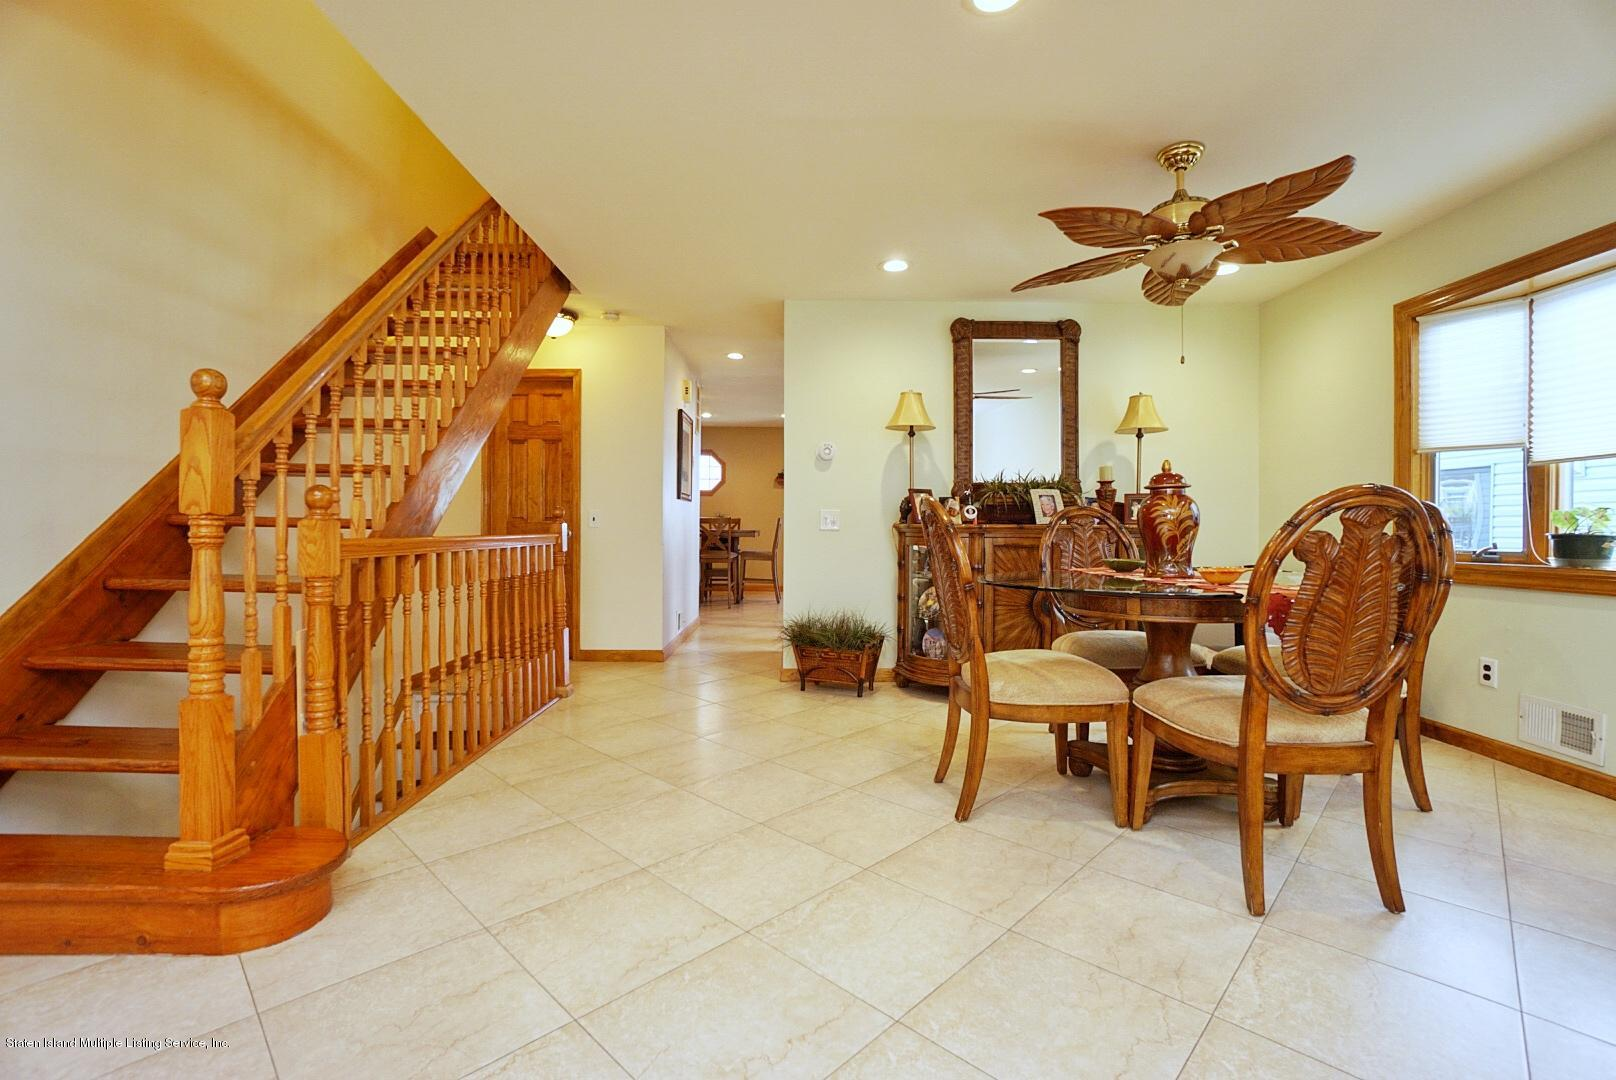 Single Family - Semi-Attached 47 Ilyse Court   Staten Island, NY 10306, MLS-1141335-5